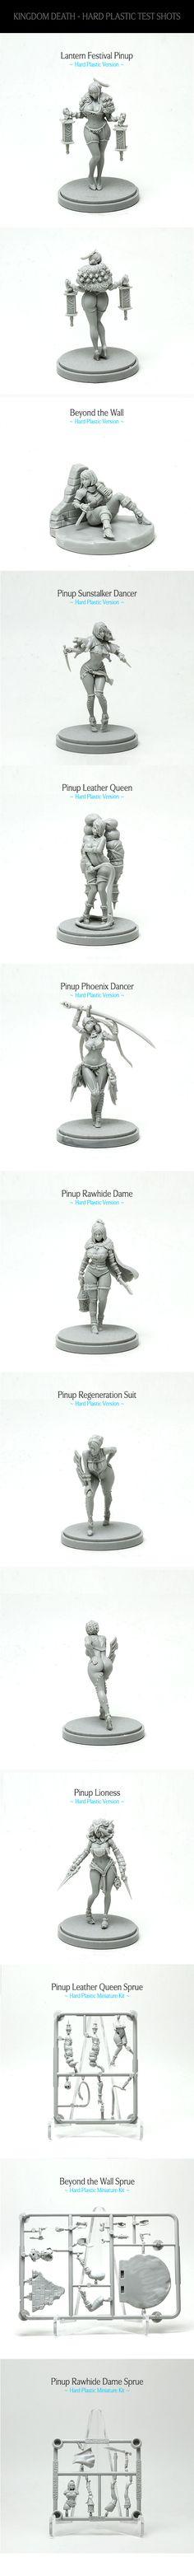 Kingdom Death : Monster by Kingdom Death » Updates — Kickstarter